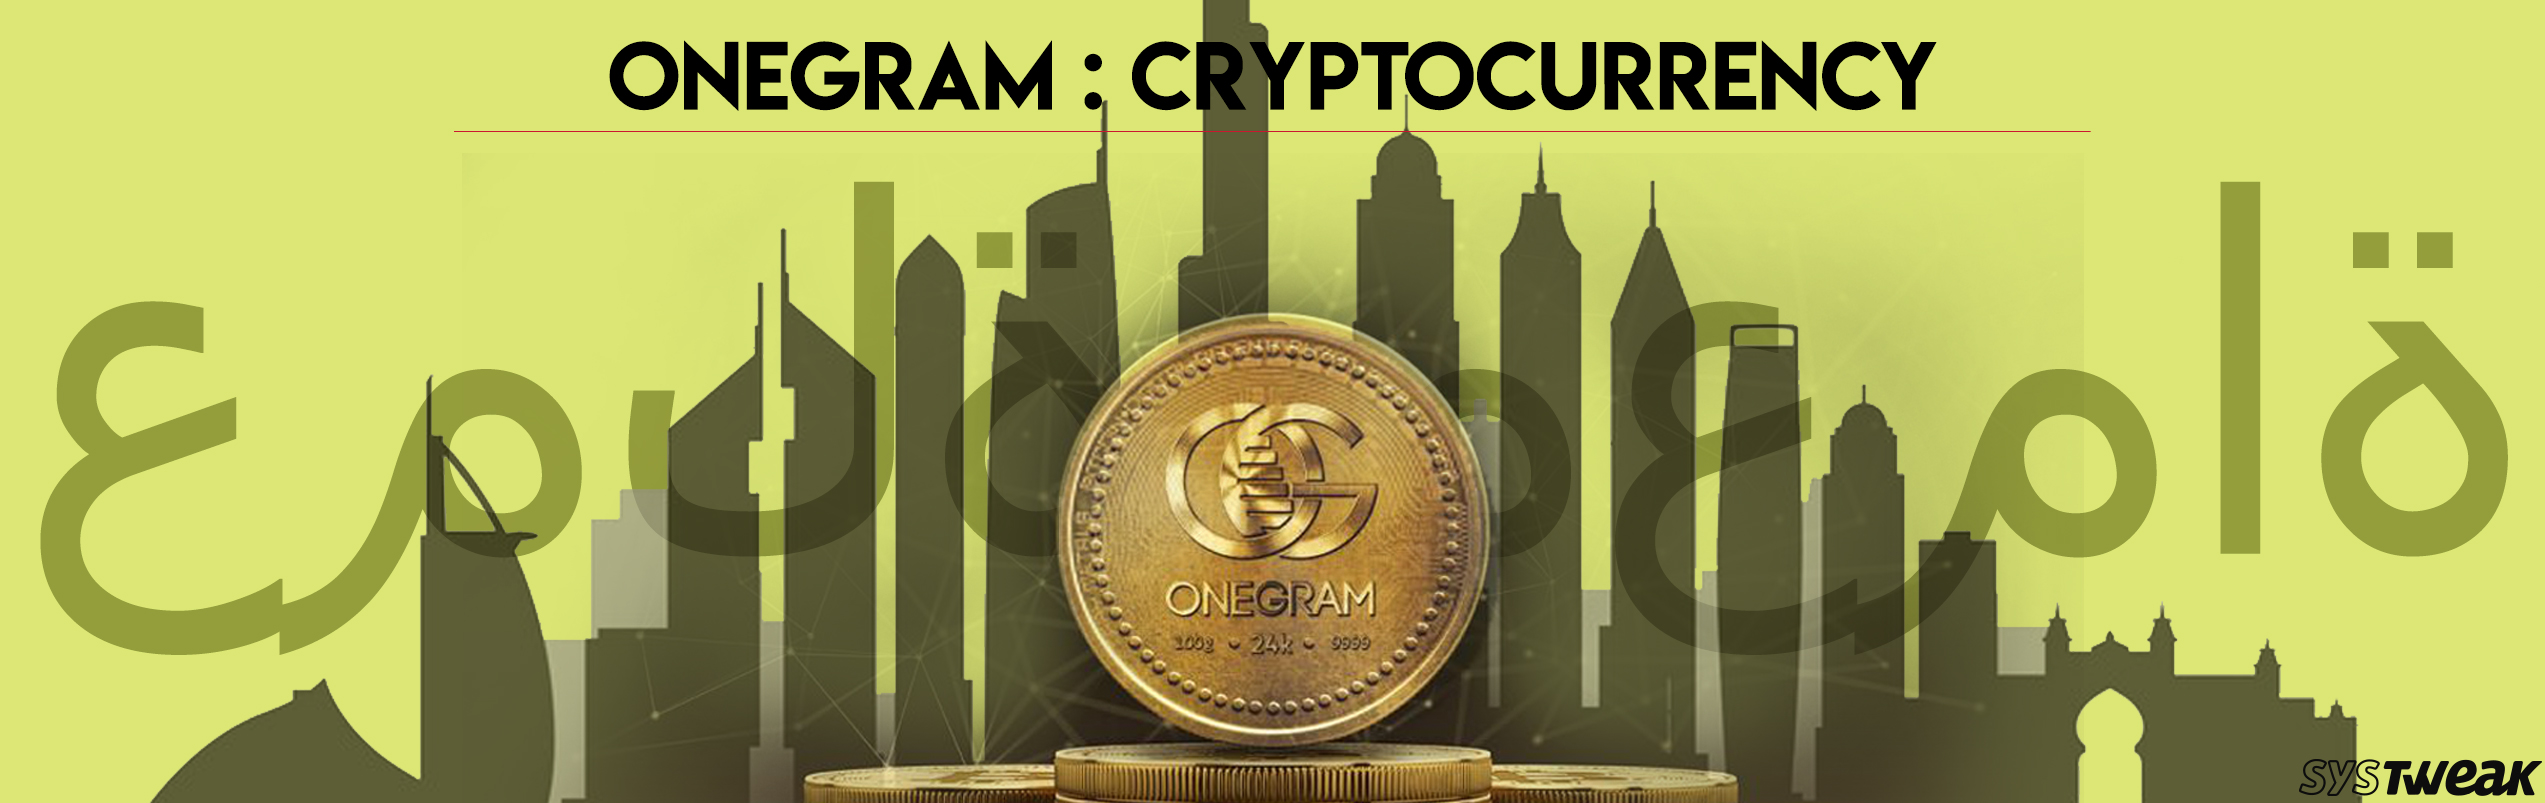 OneGram: The Bridge Between Islamic Banking And Blockchain